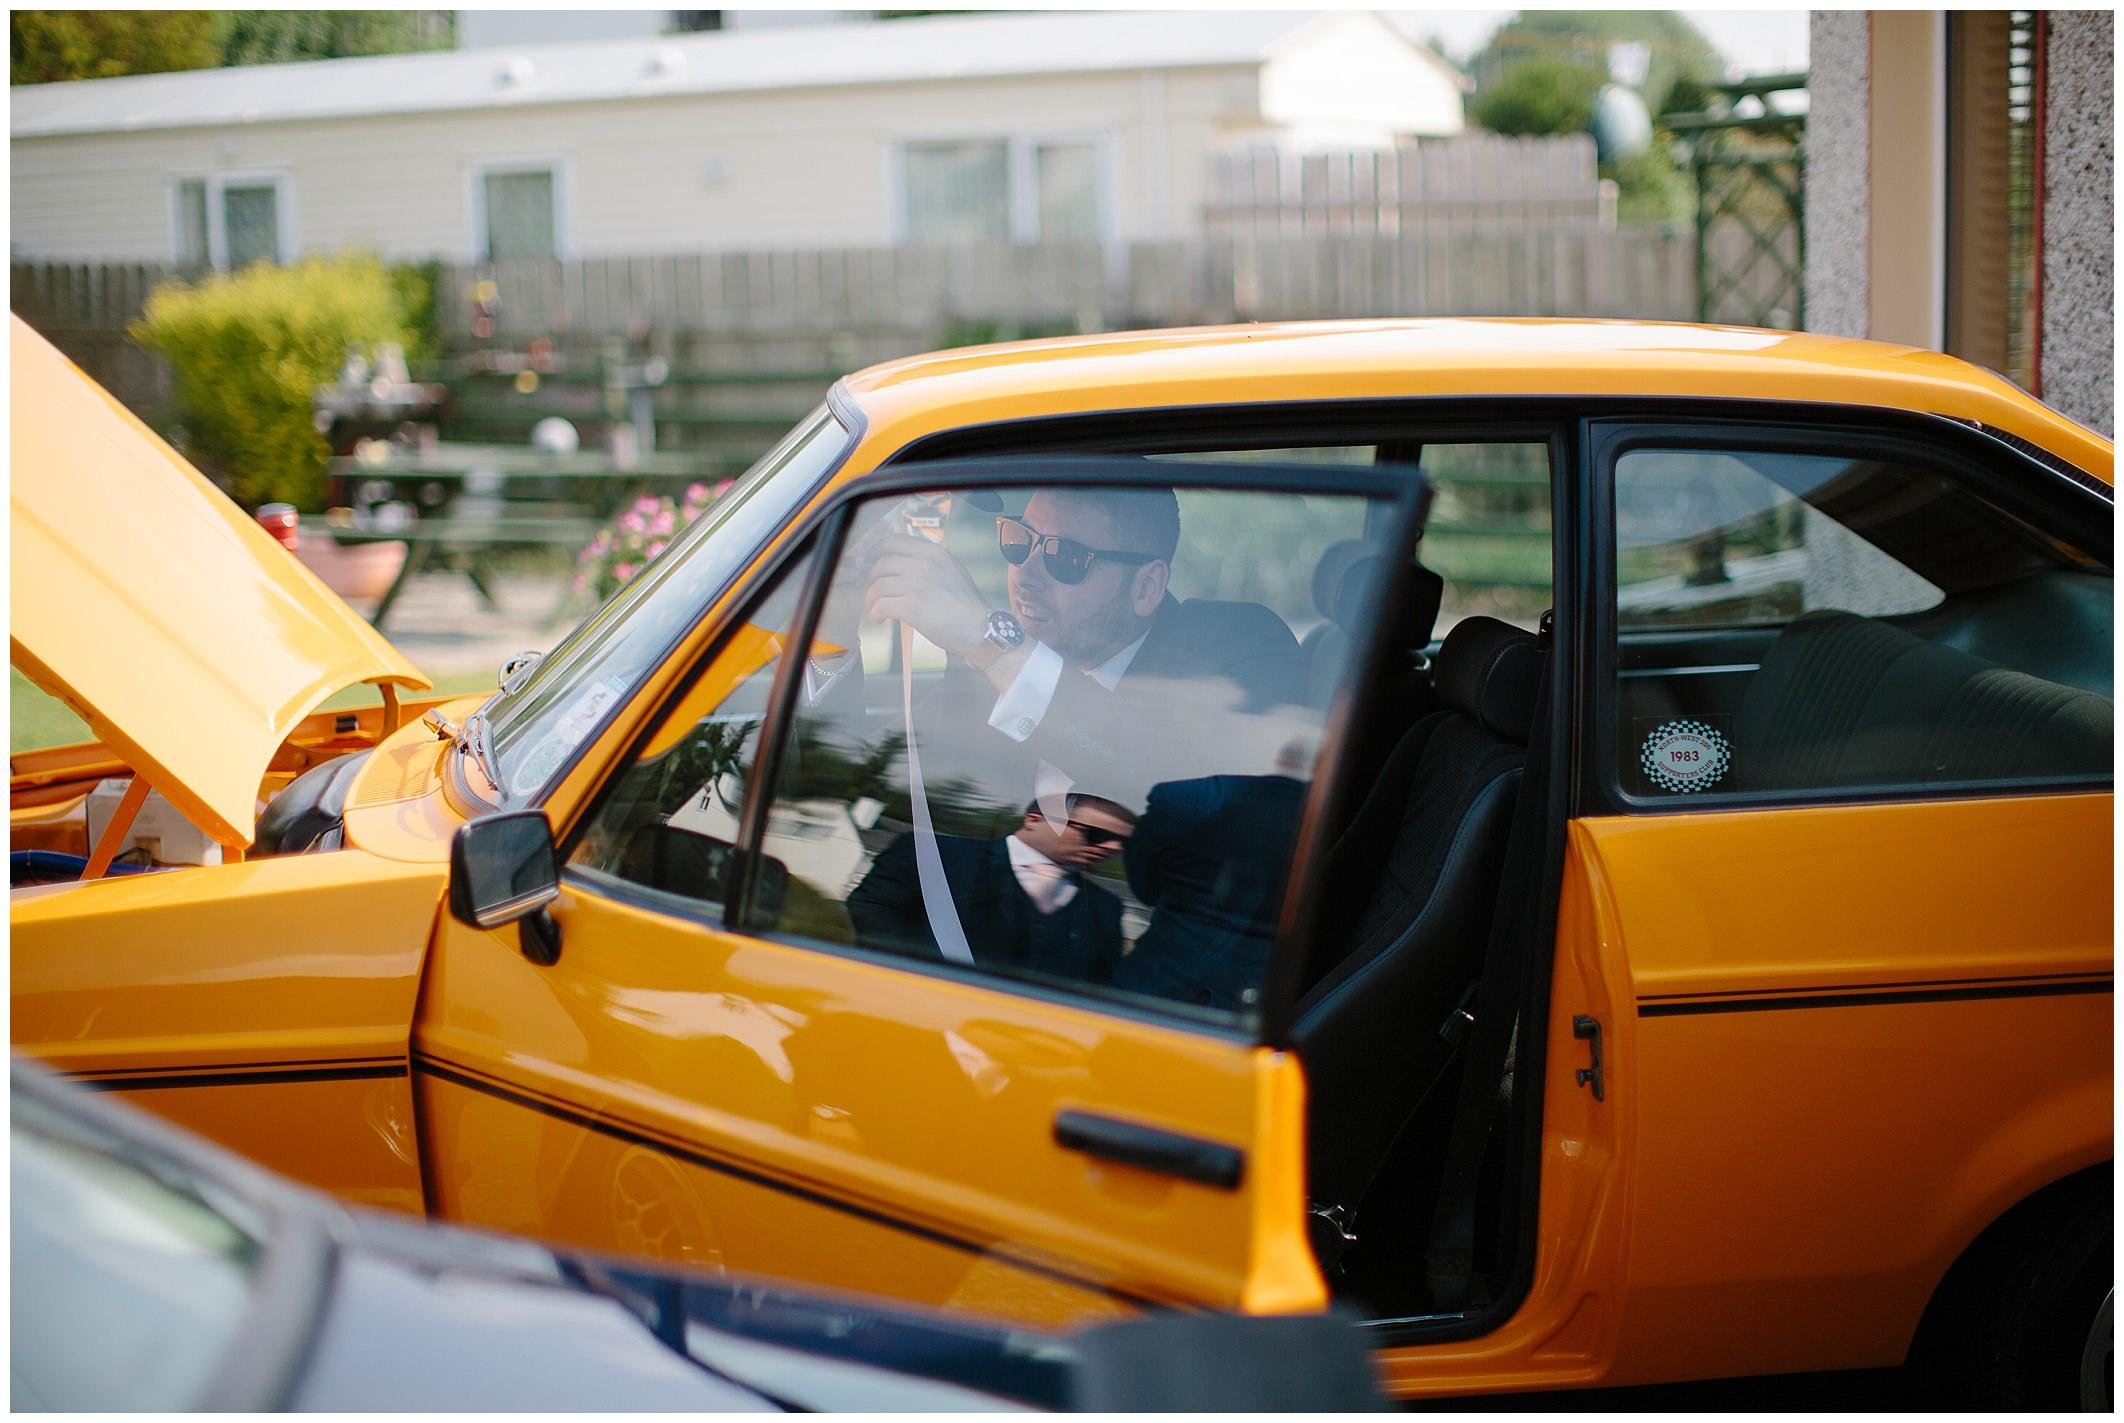 redcastle-hotel-wedding-karen-brian-jude-browne-photography-040.jpg